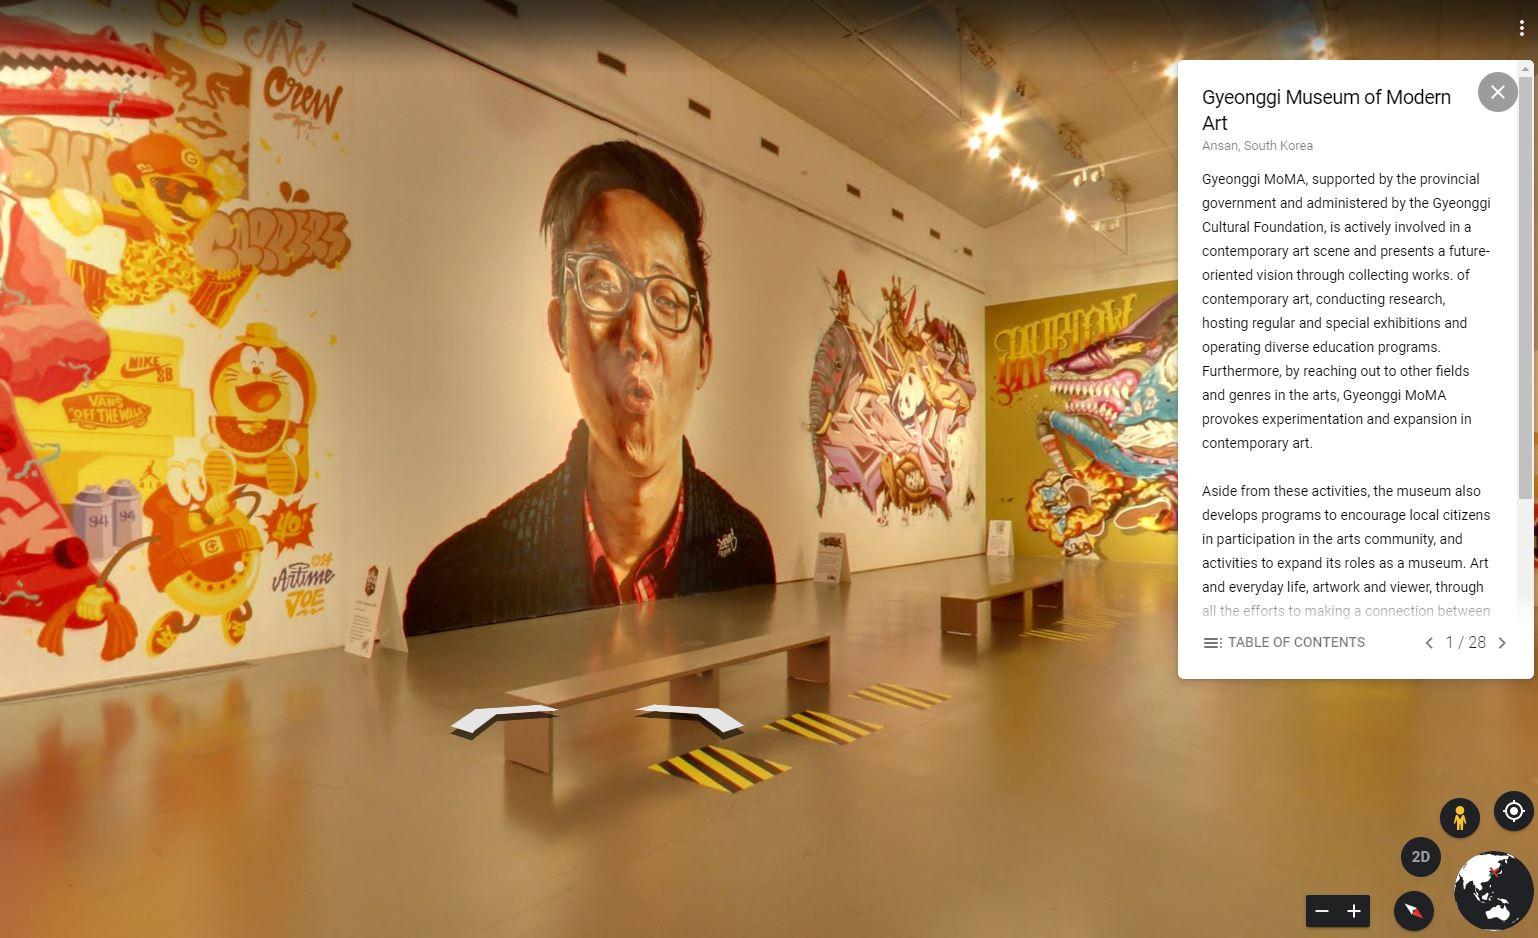 Gyeonggi Museum of Modern Art, Ansan, South Korea